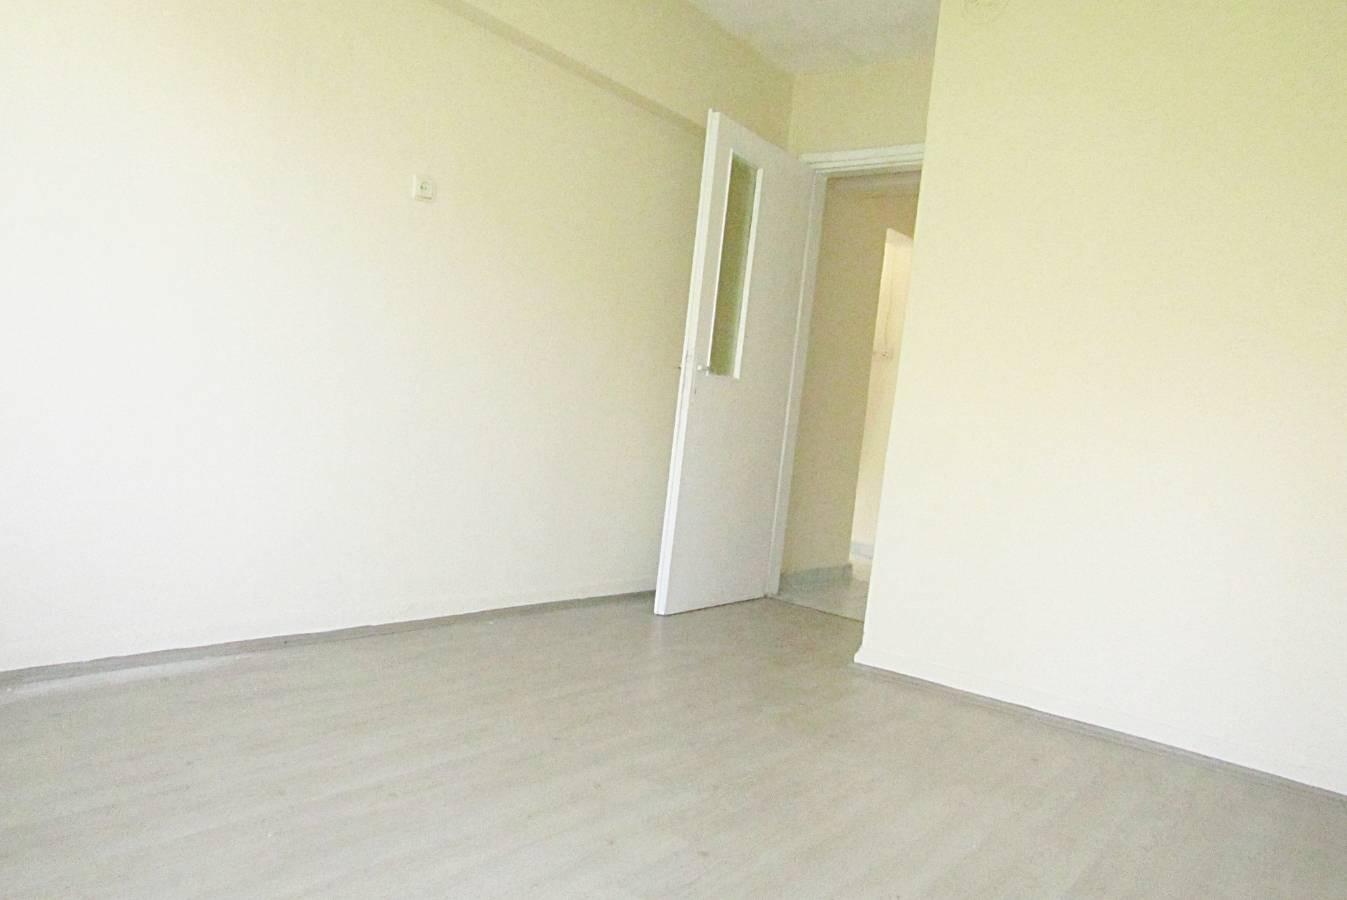 SR EMLAK'TAN İSTASYON MAH'DE 3+1 110 m² TRENE YAKIN  KATTA   DAİRE